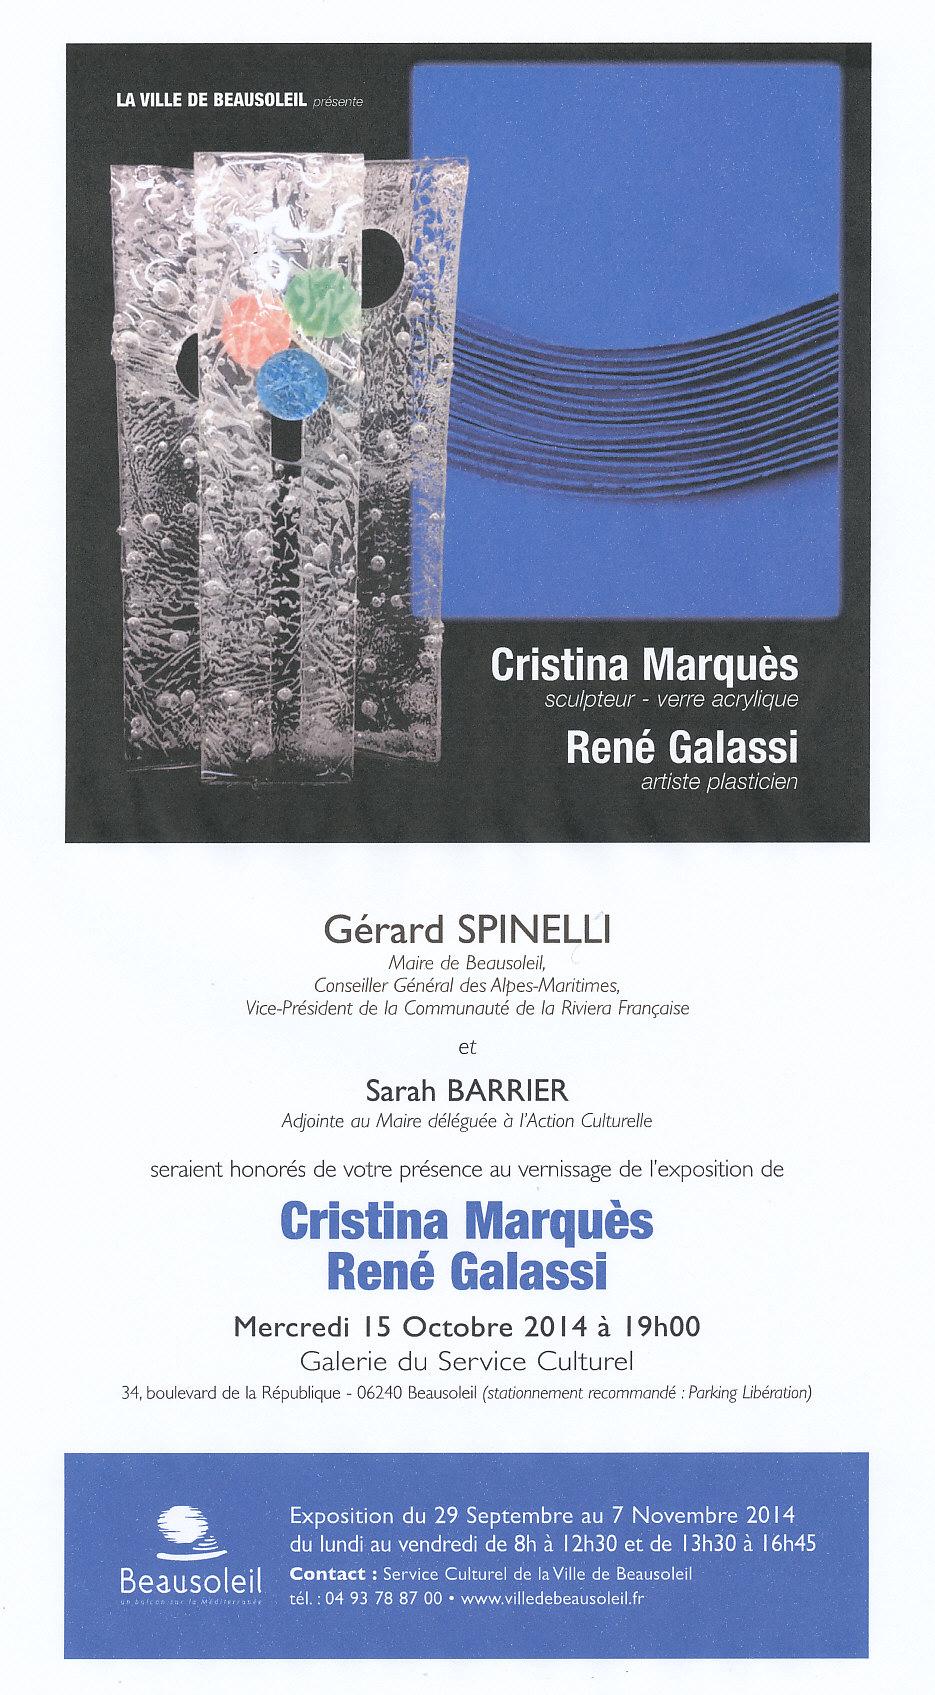 Invitation Marqués-Galassi